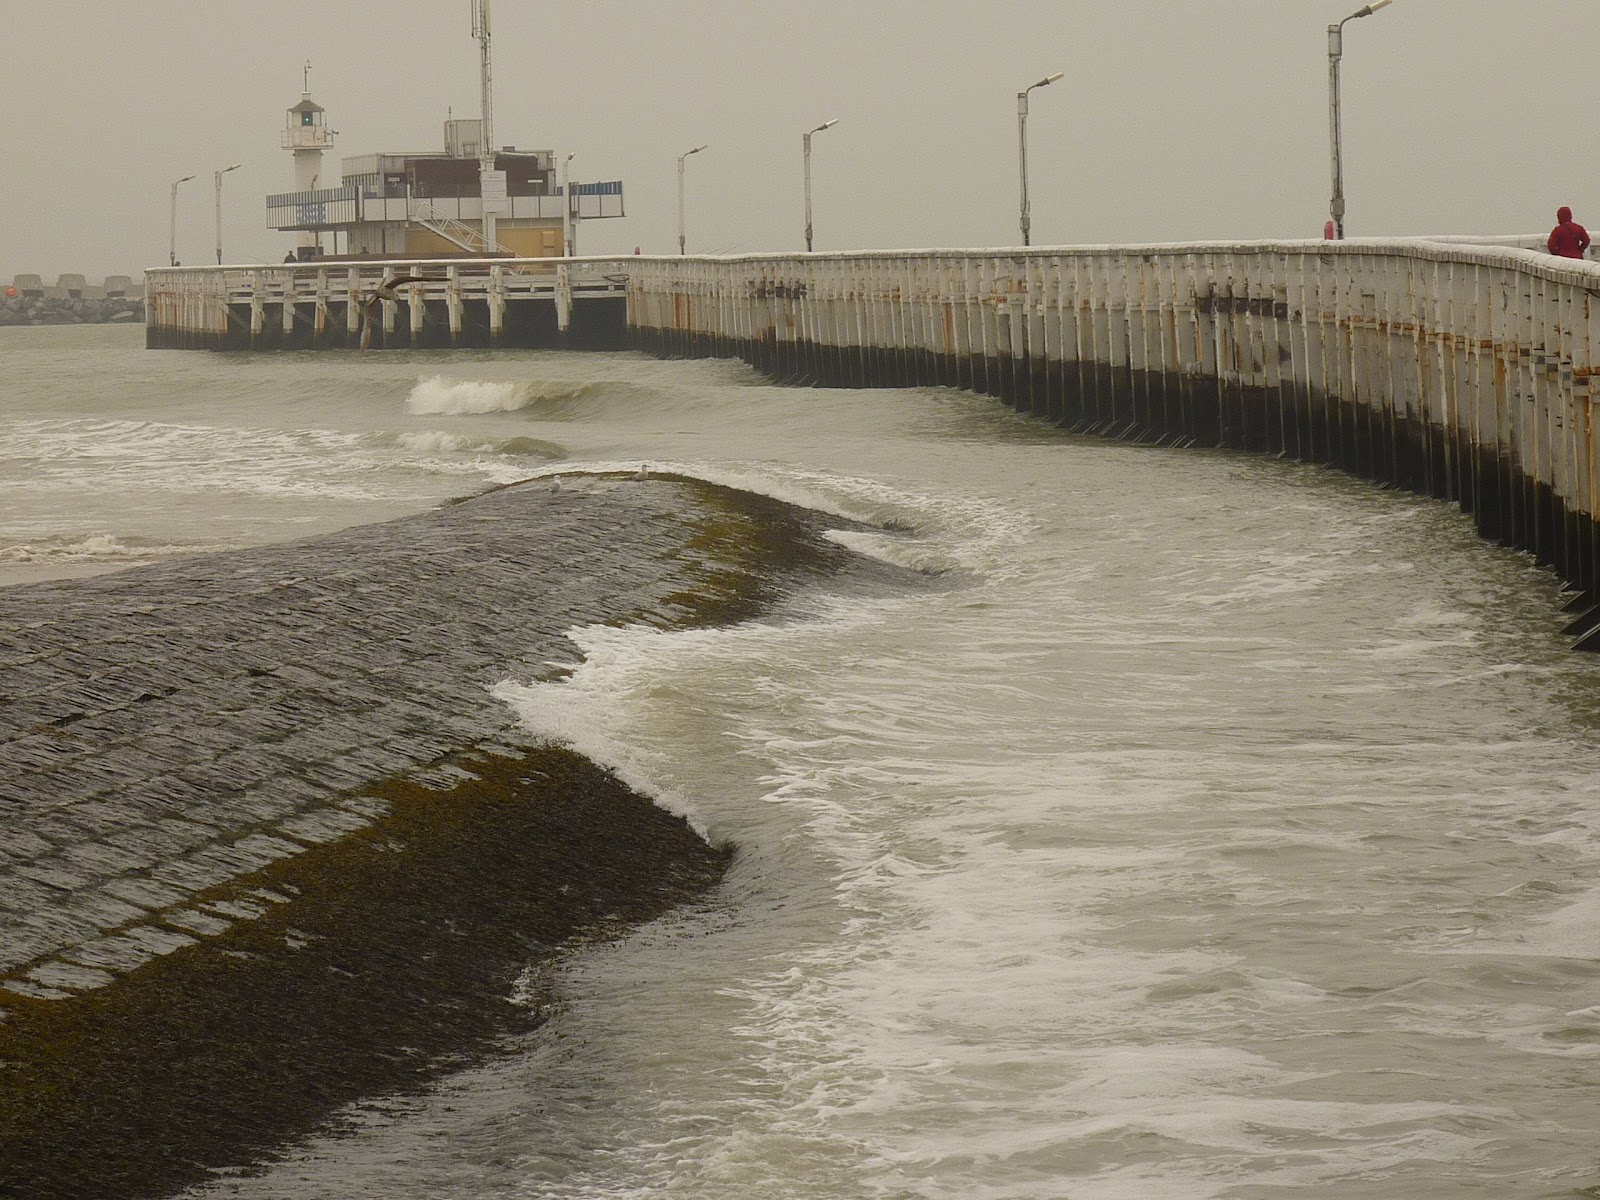 Wetter In Ostende